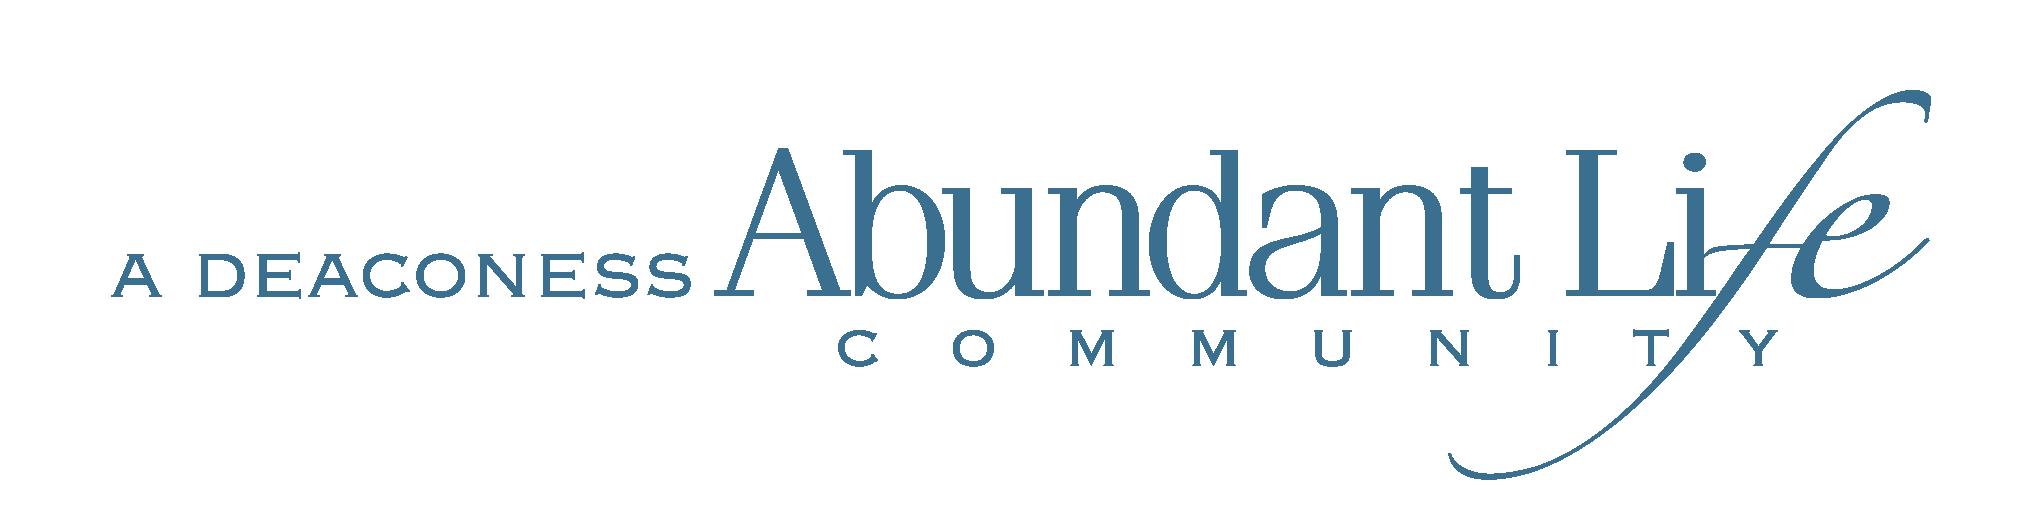 A Deaconess Abundant Life Community Logo